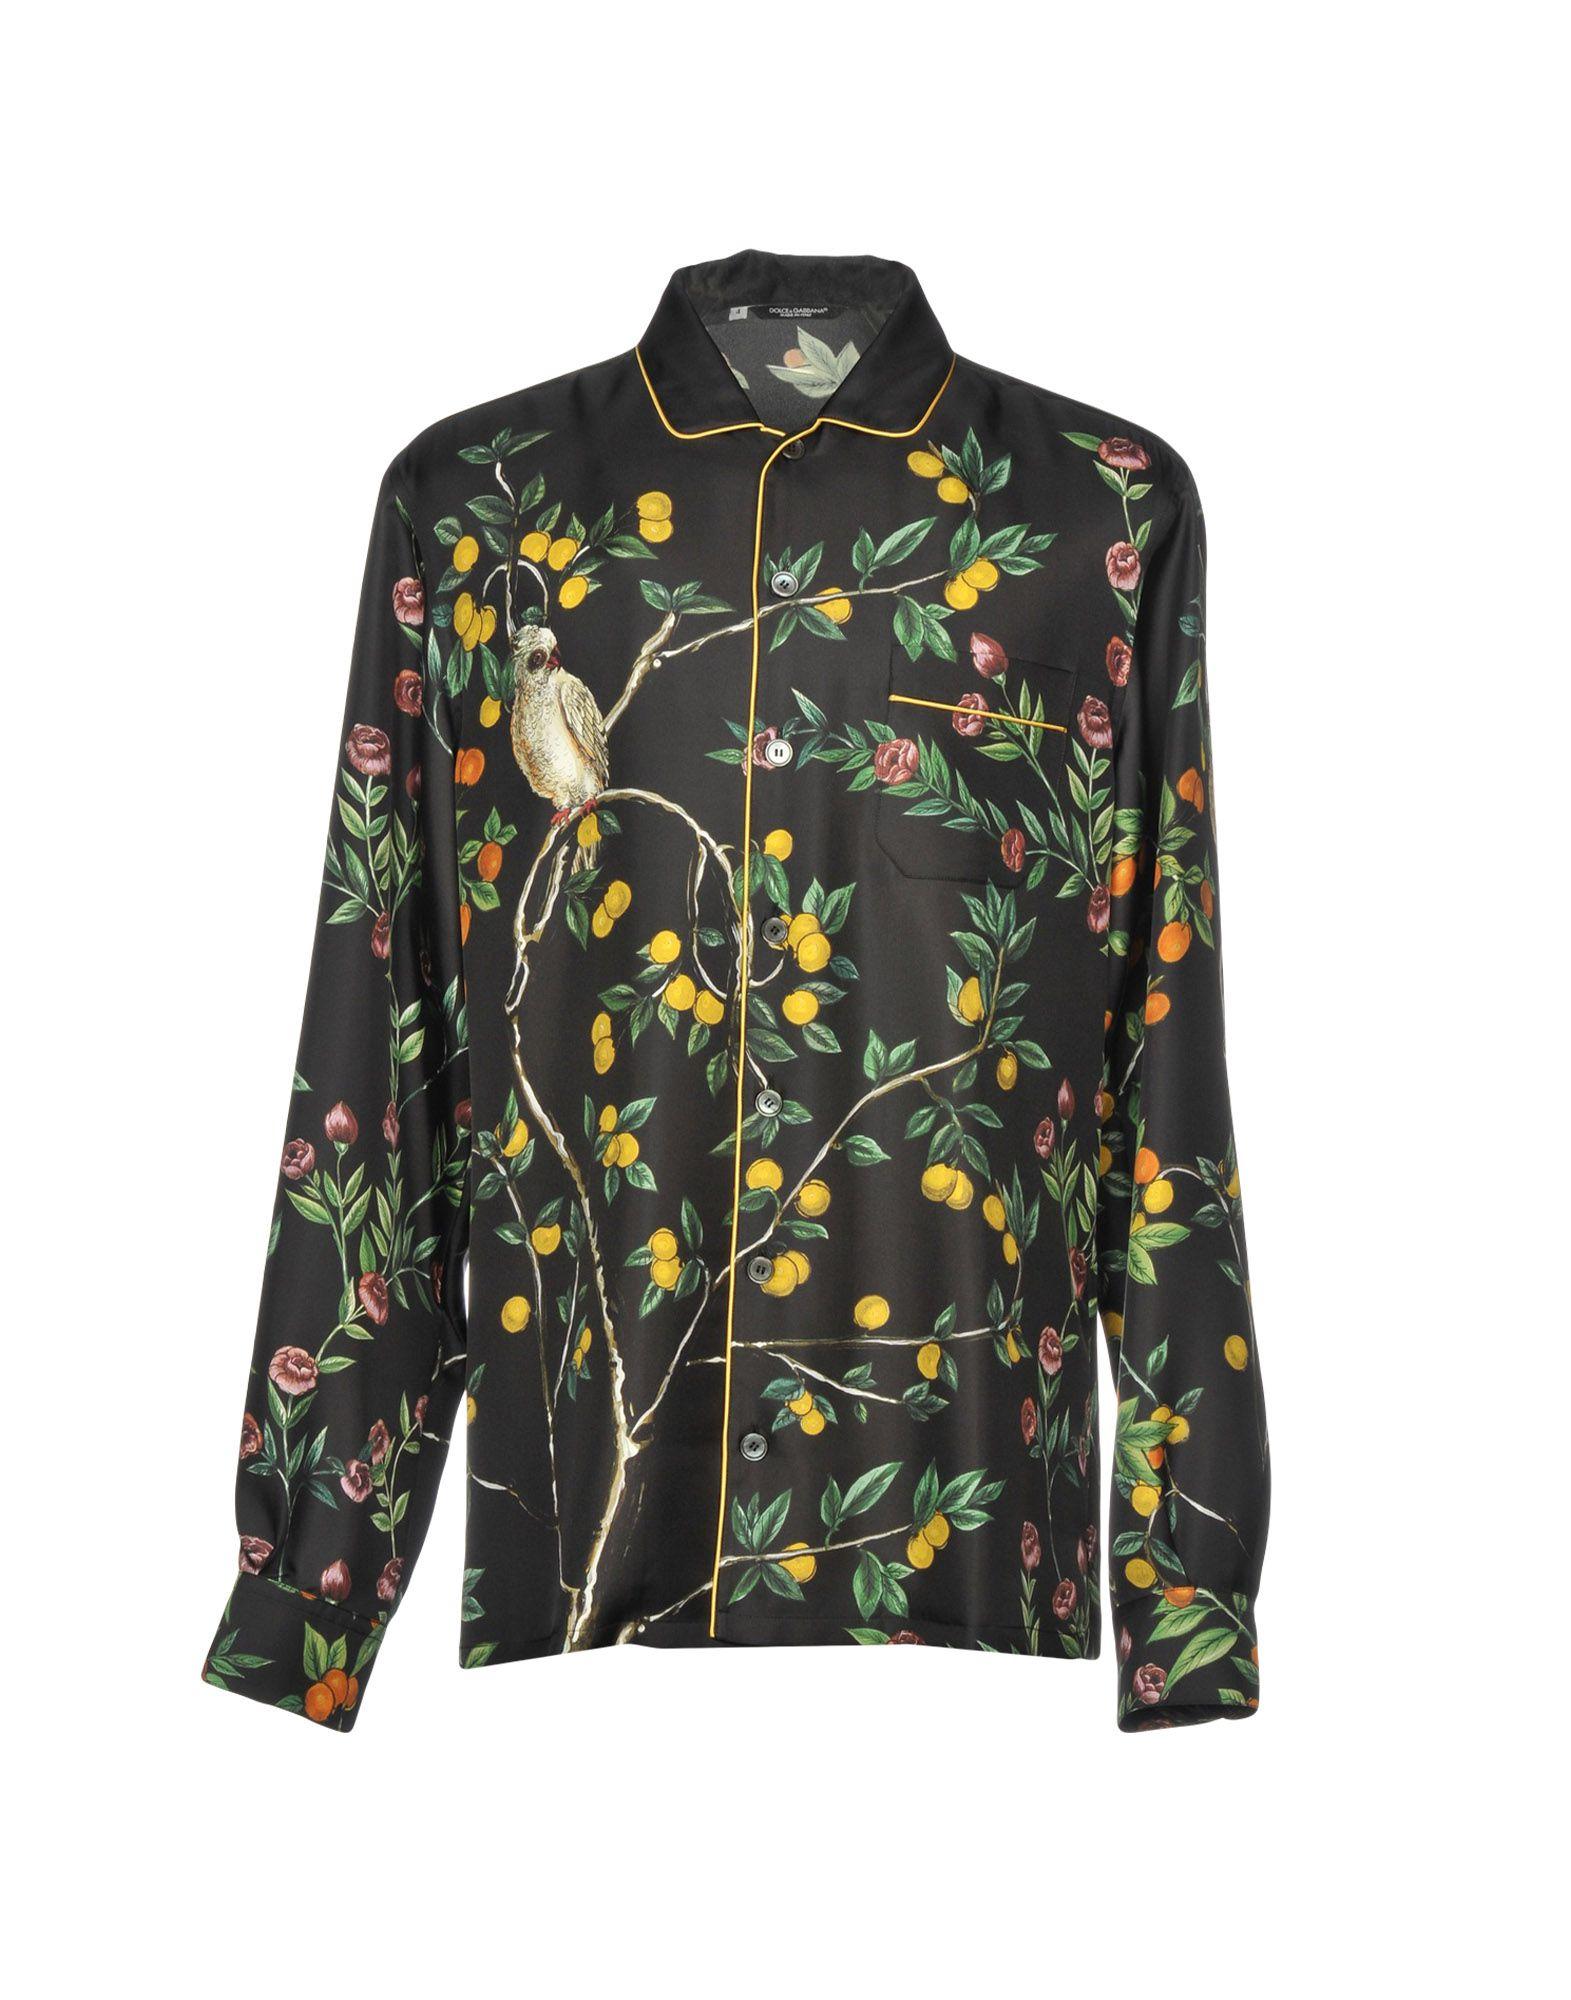 Camicia Camicia Camicia Fantasia Dolce & Gabbana Uomo - 38757422VD 5b830a